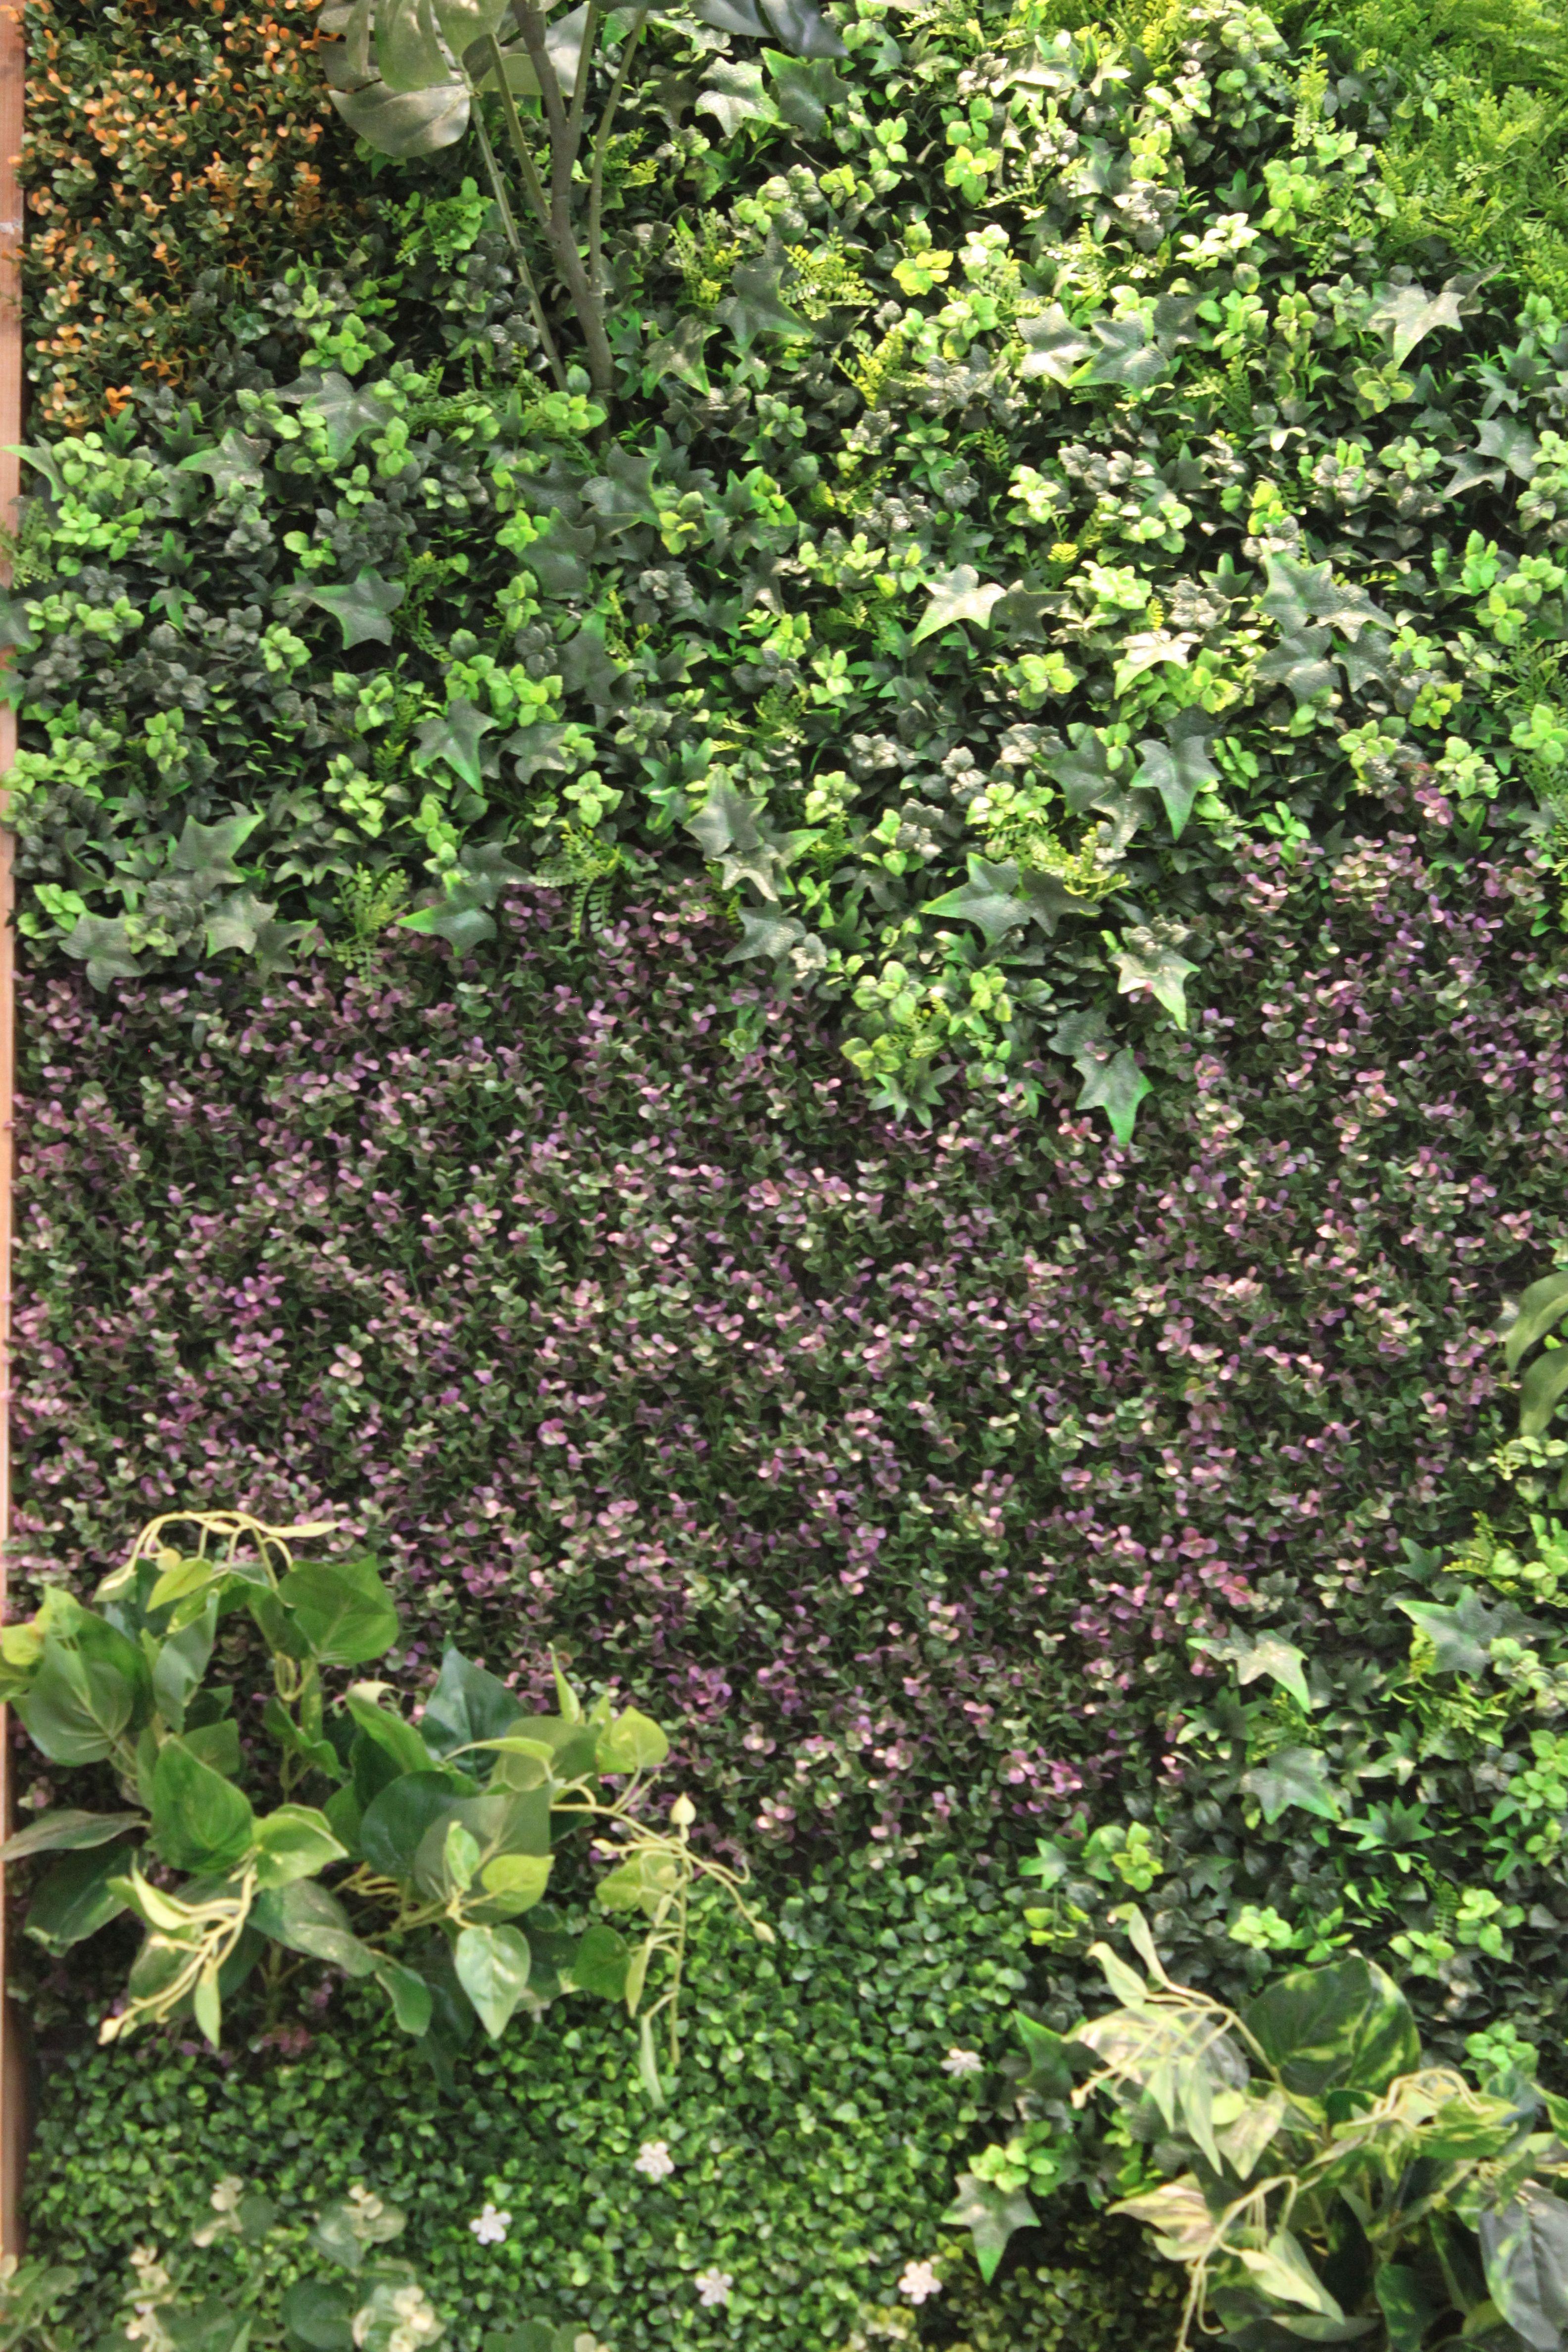 #Muro #Verde #Exterior #Interior #Jardin